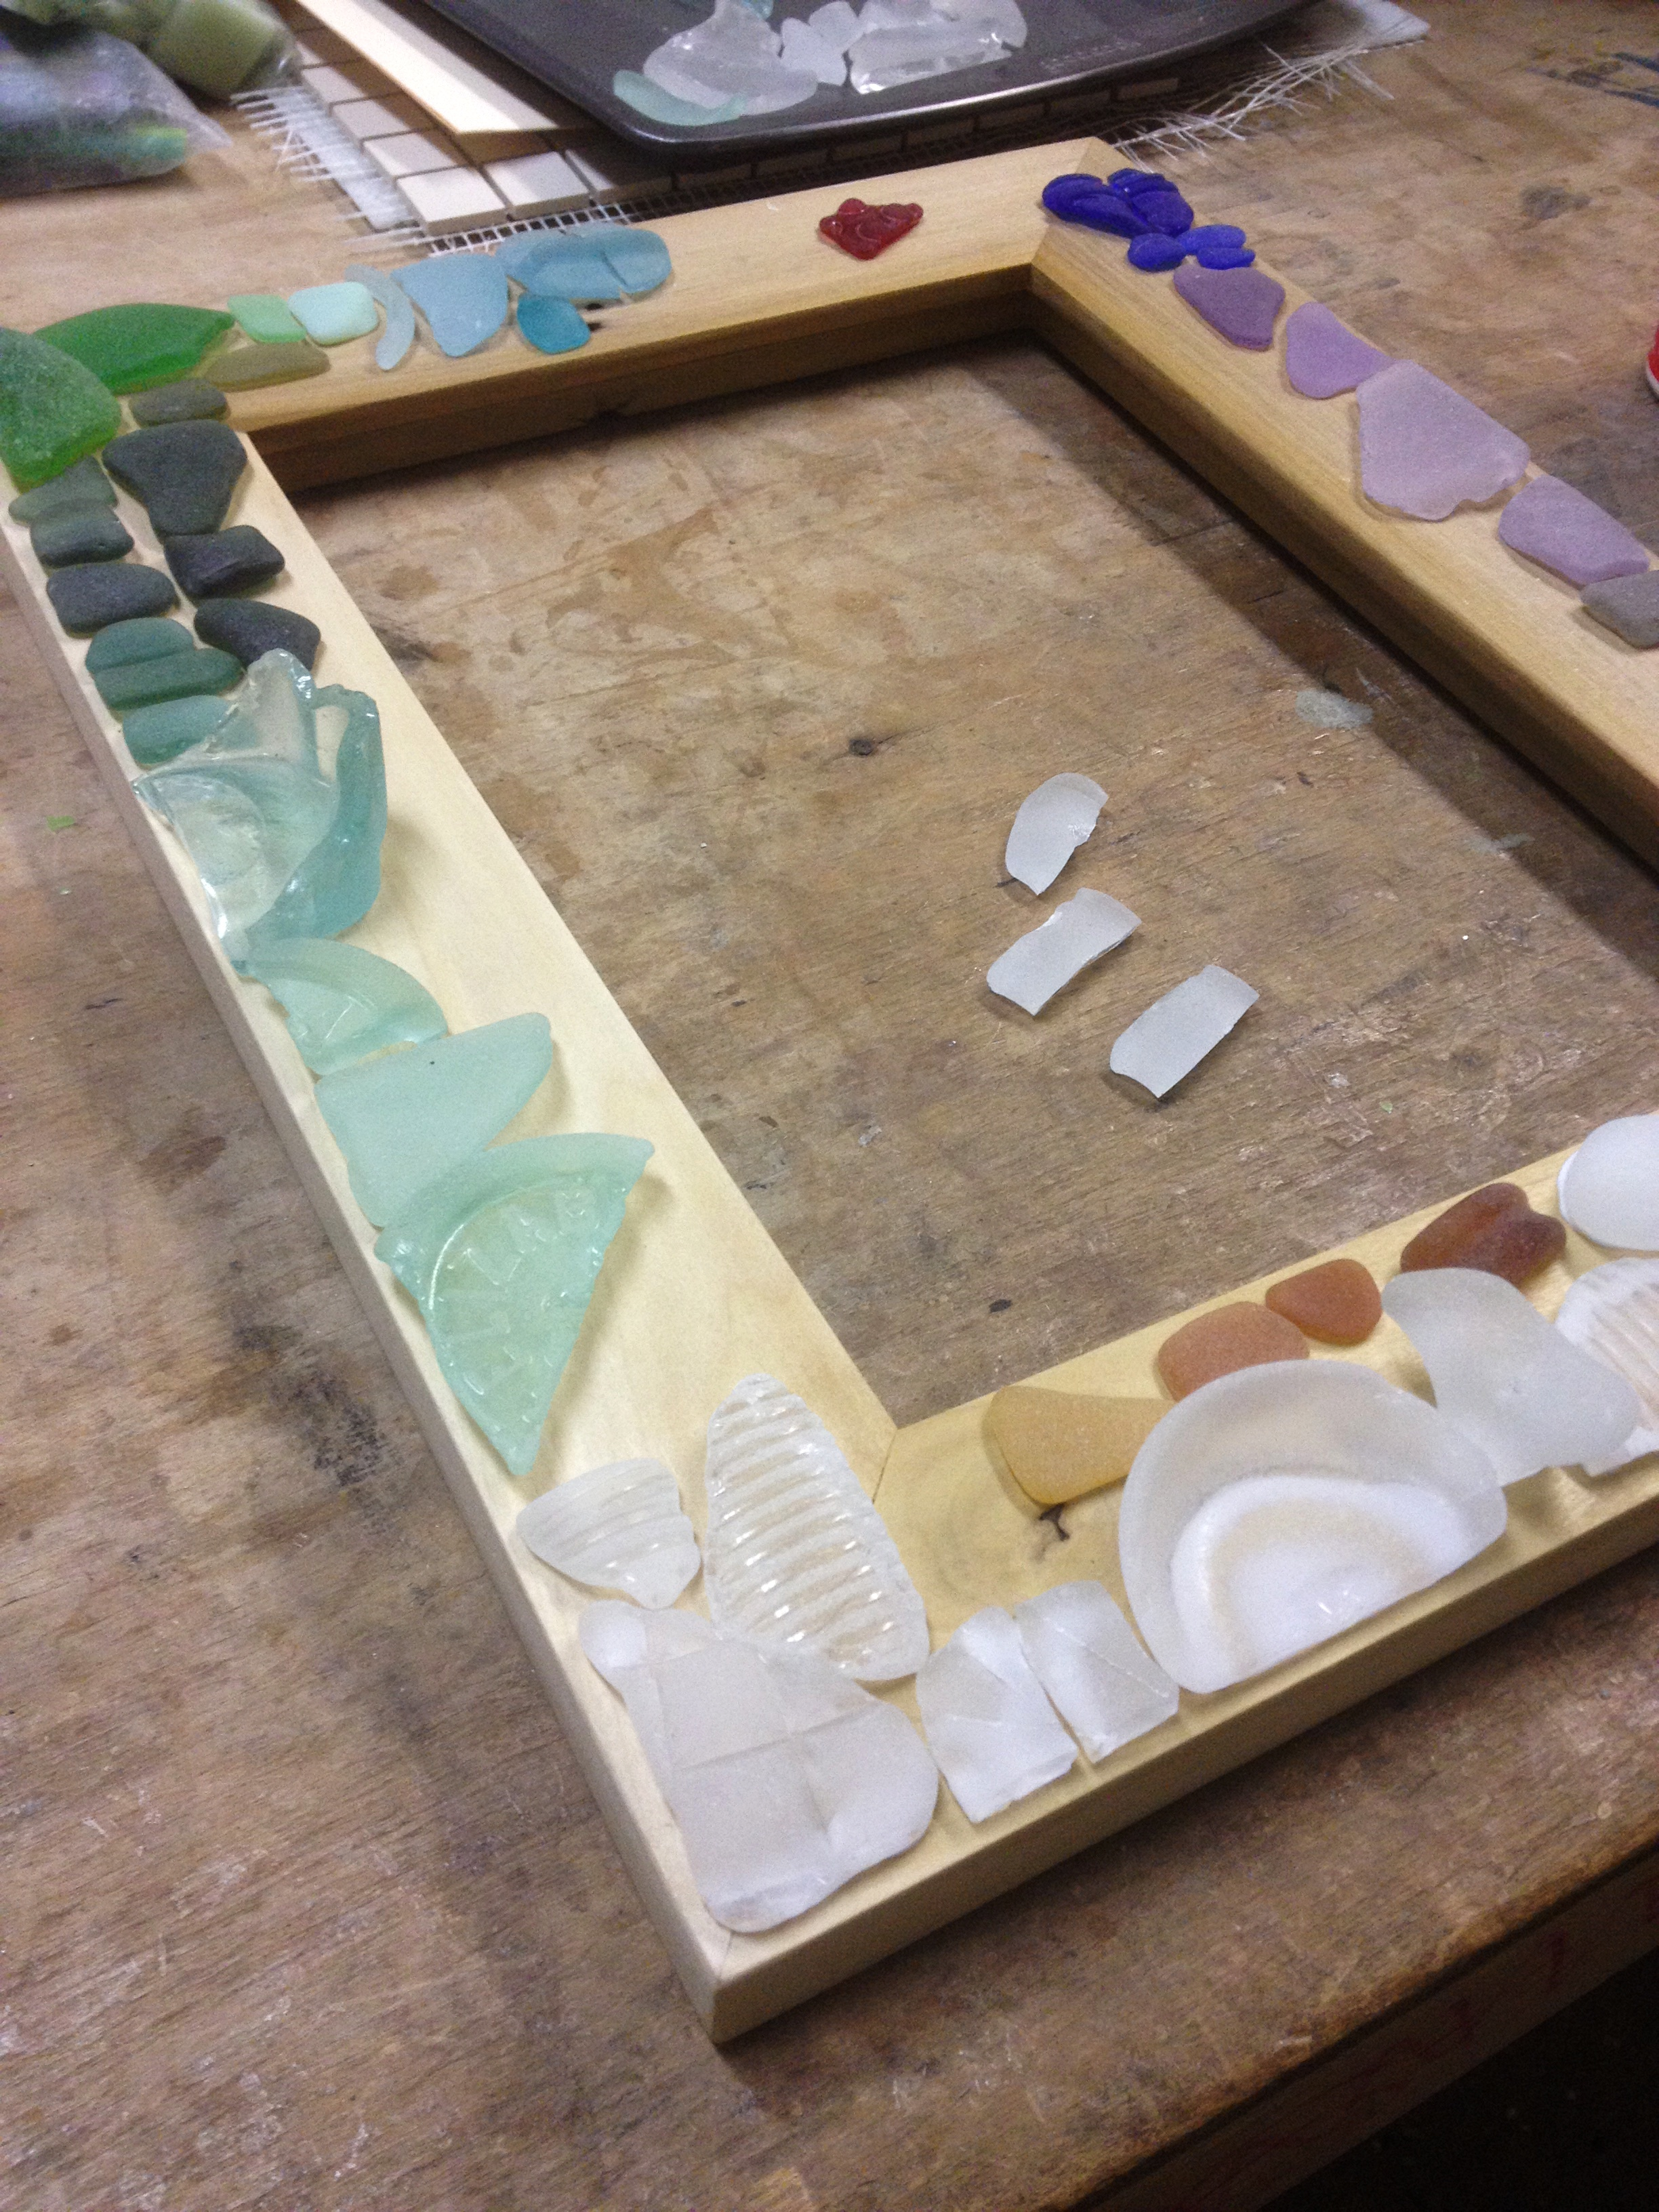 Custom seaglass mosaic mirror in progress